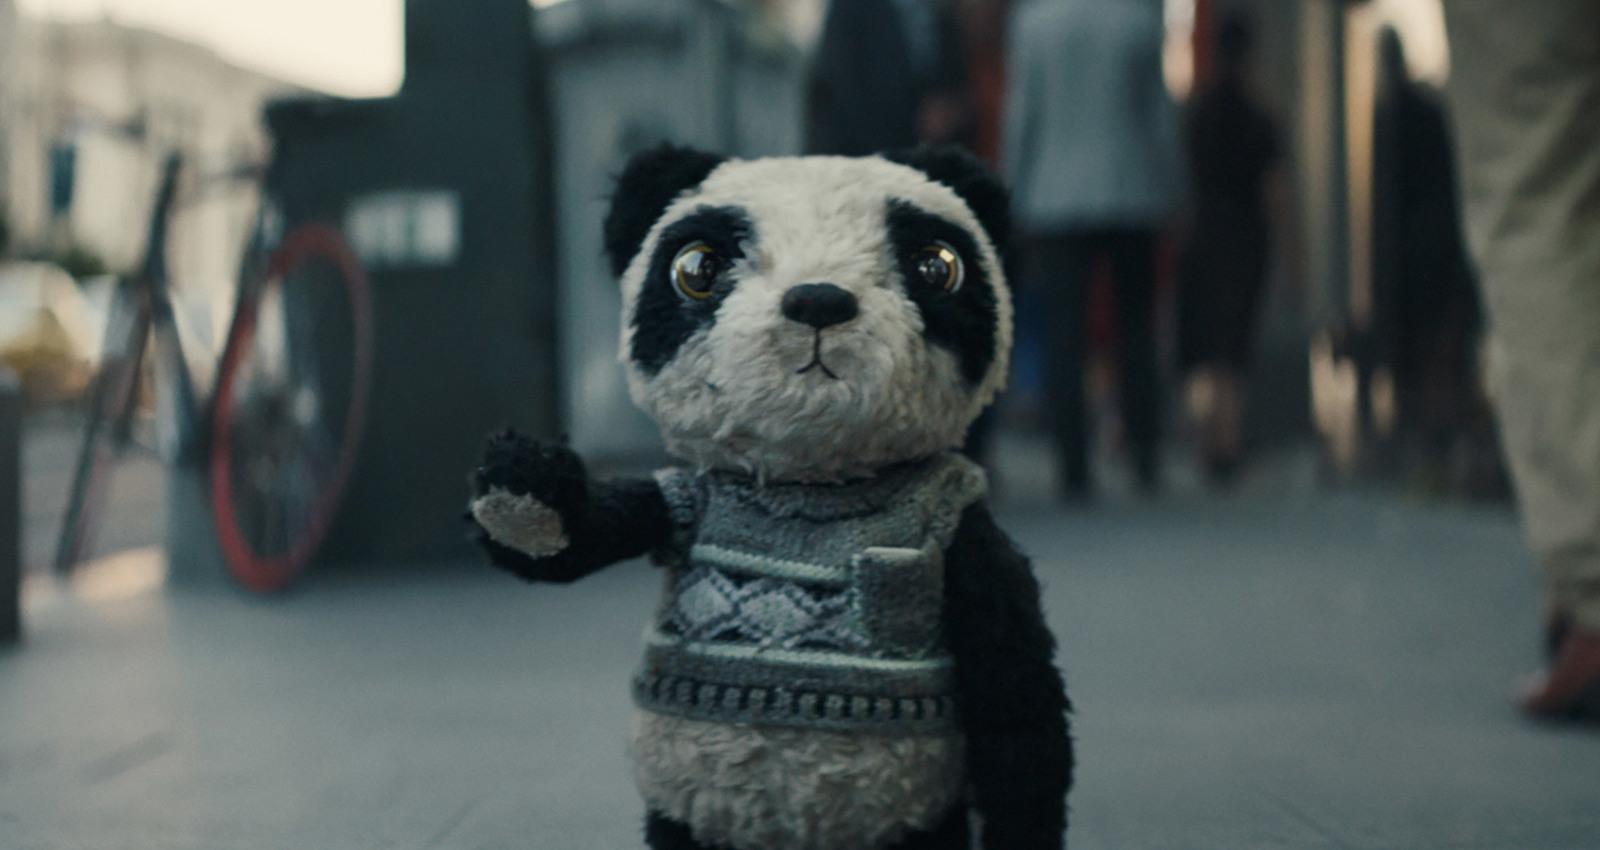 Lost Panda